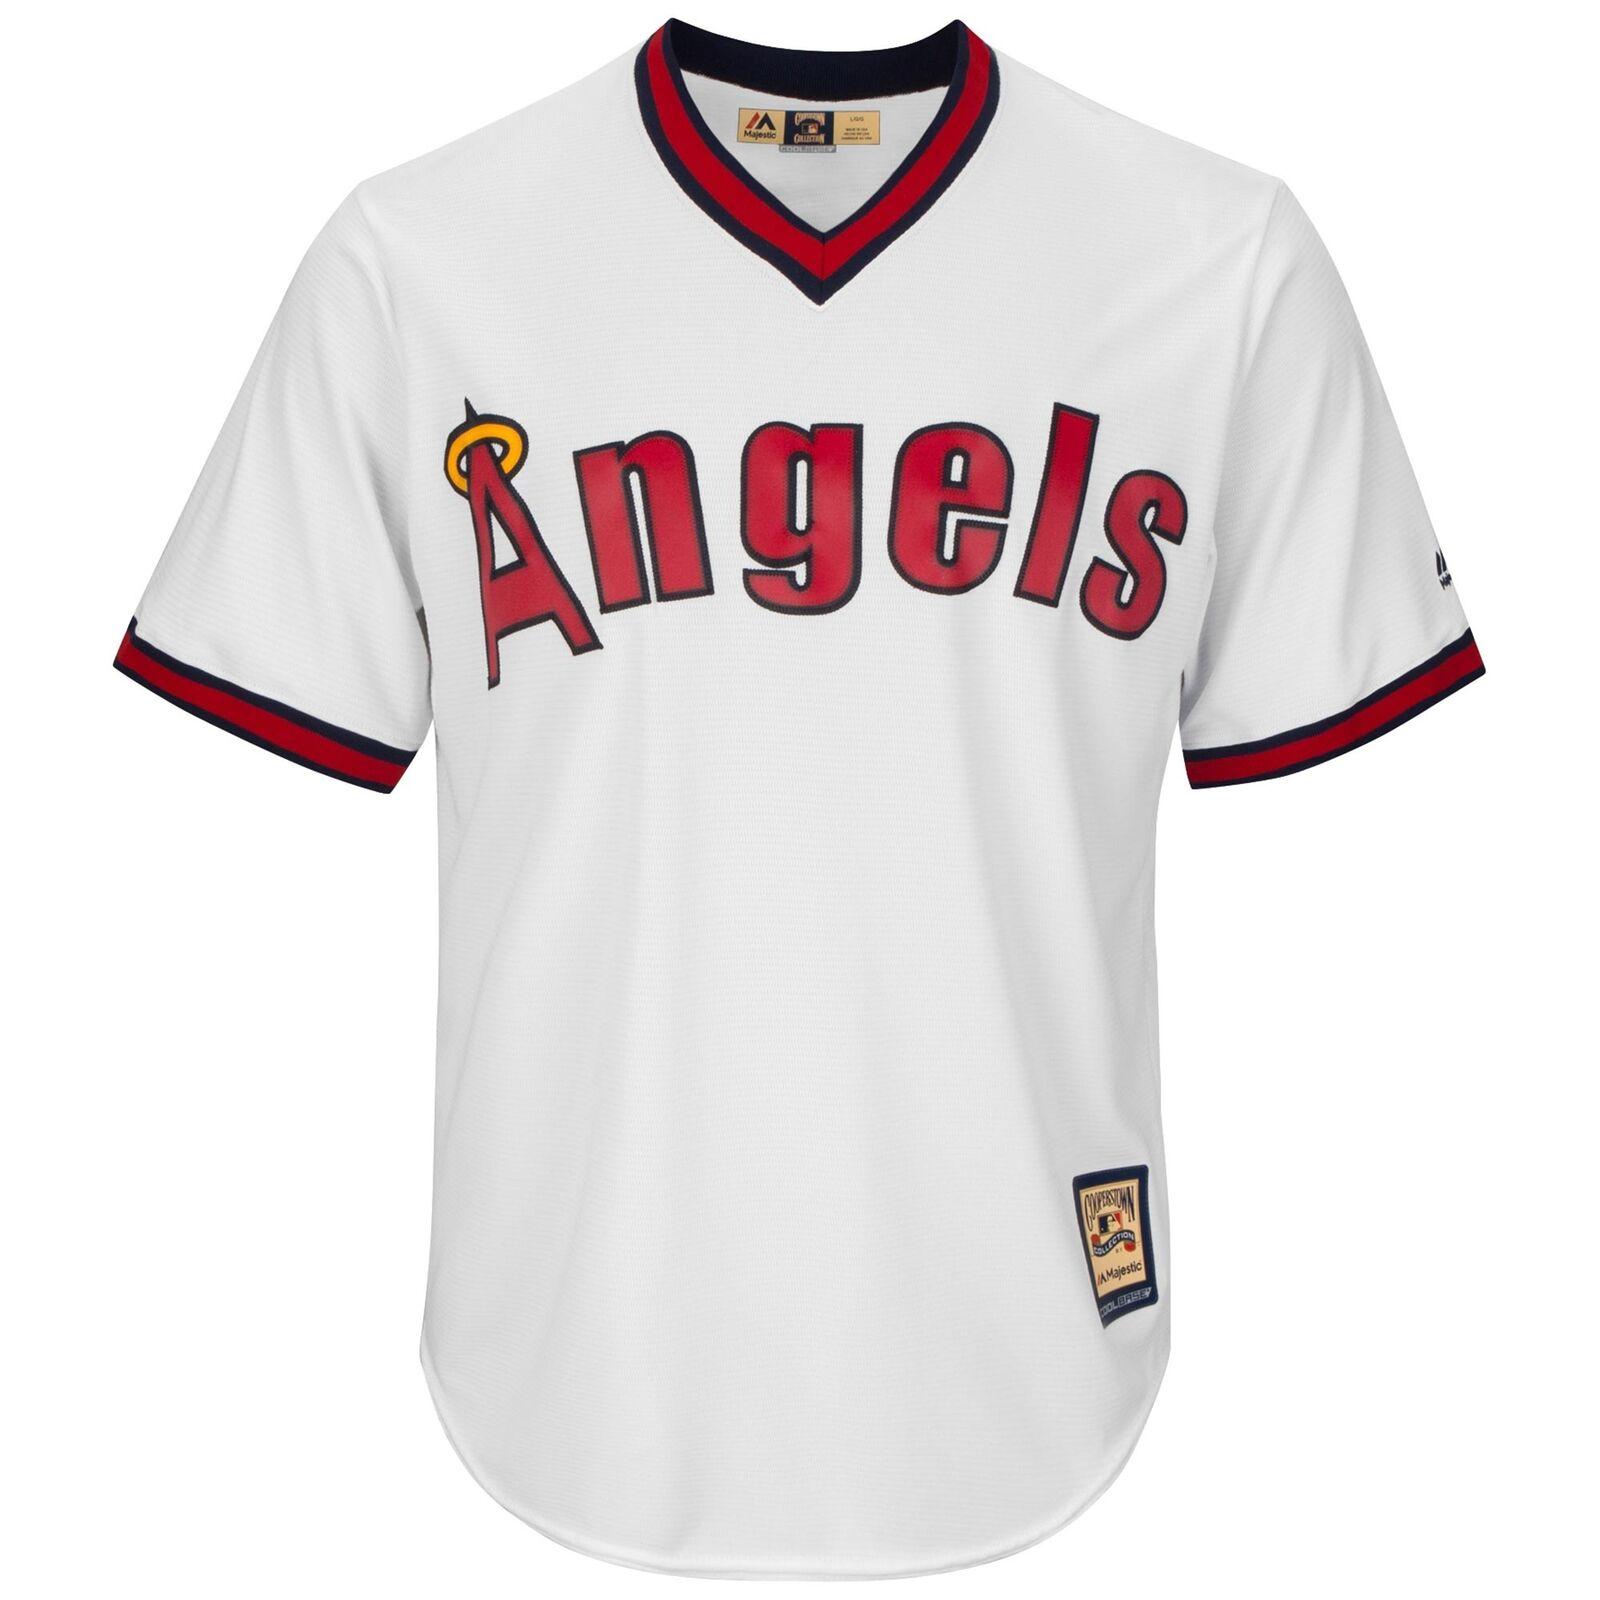 MLB California Angels Majestic Cooperstown Cool Base Trikot Sport Shirt Herren